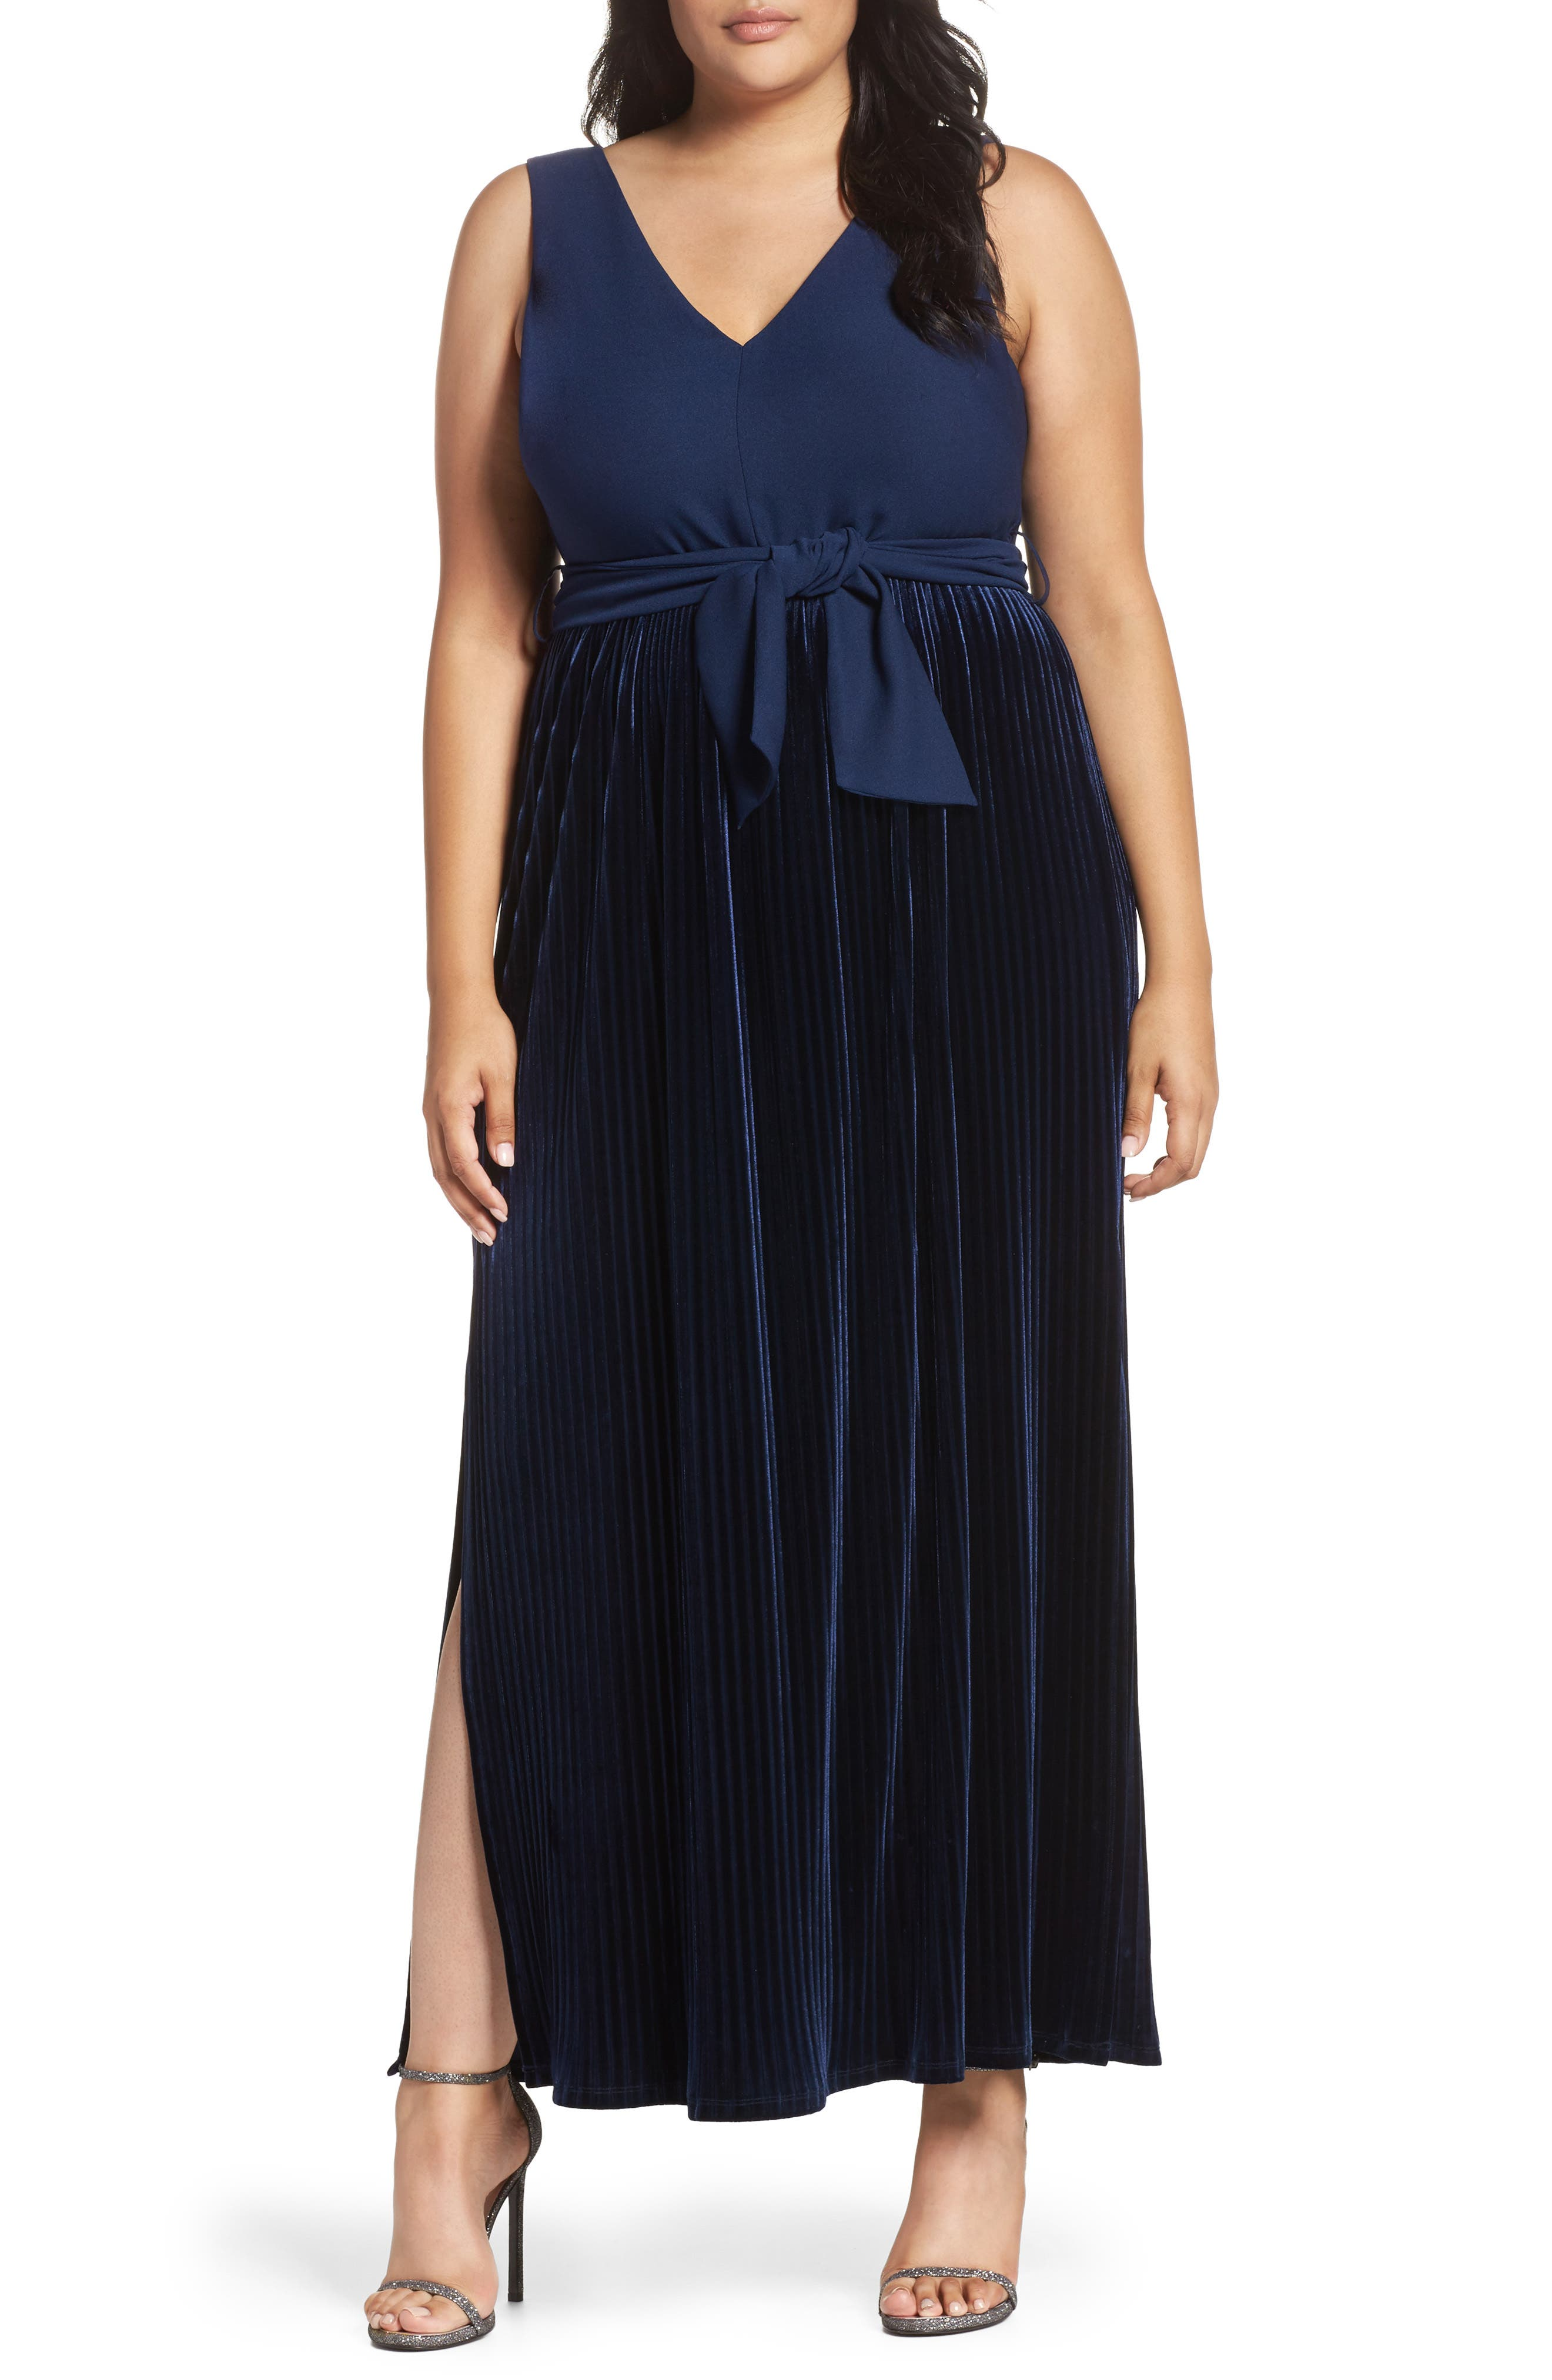 Alternate Image 1 Selected - LOST INK Crepe & Pleat Velvet Maxi Dress (Plus Size)